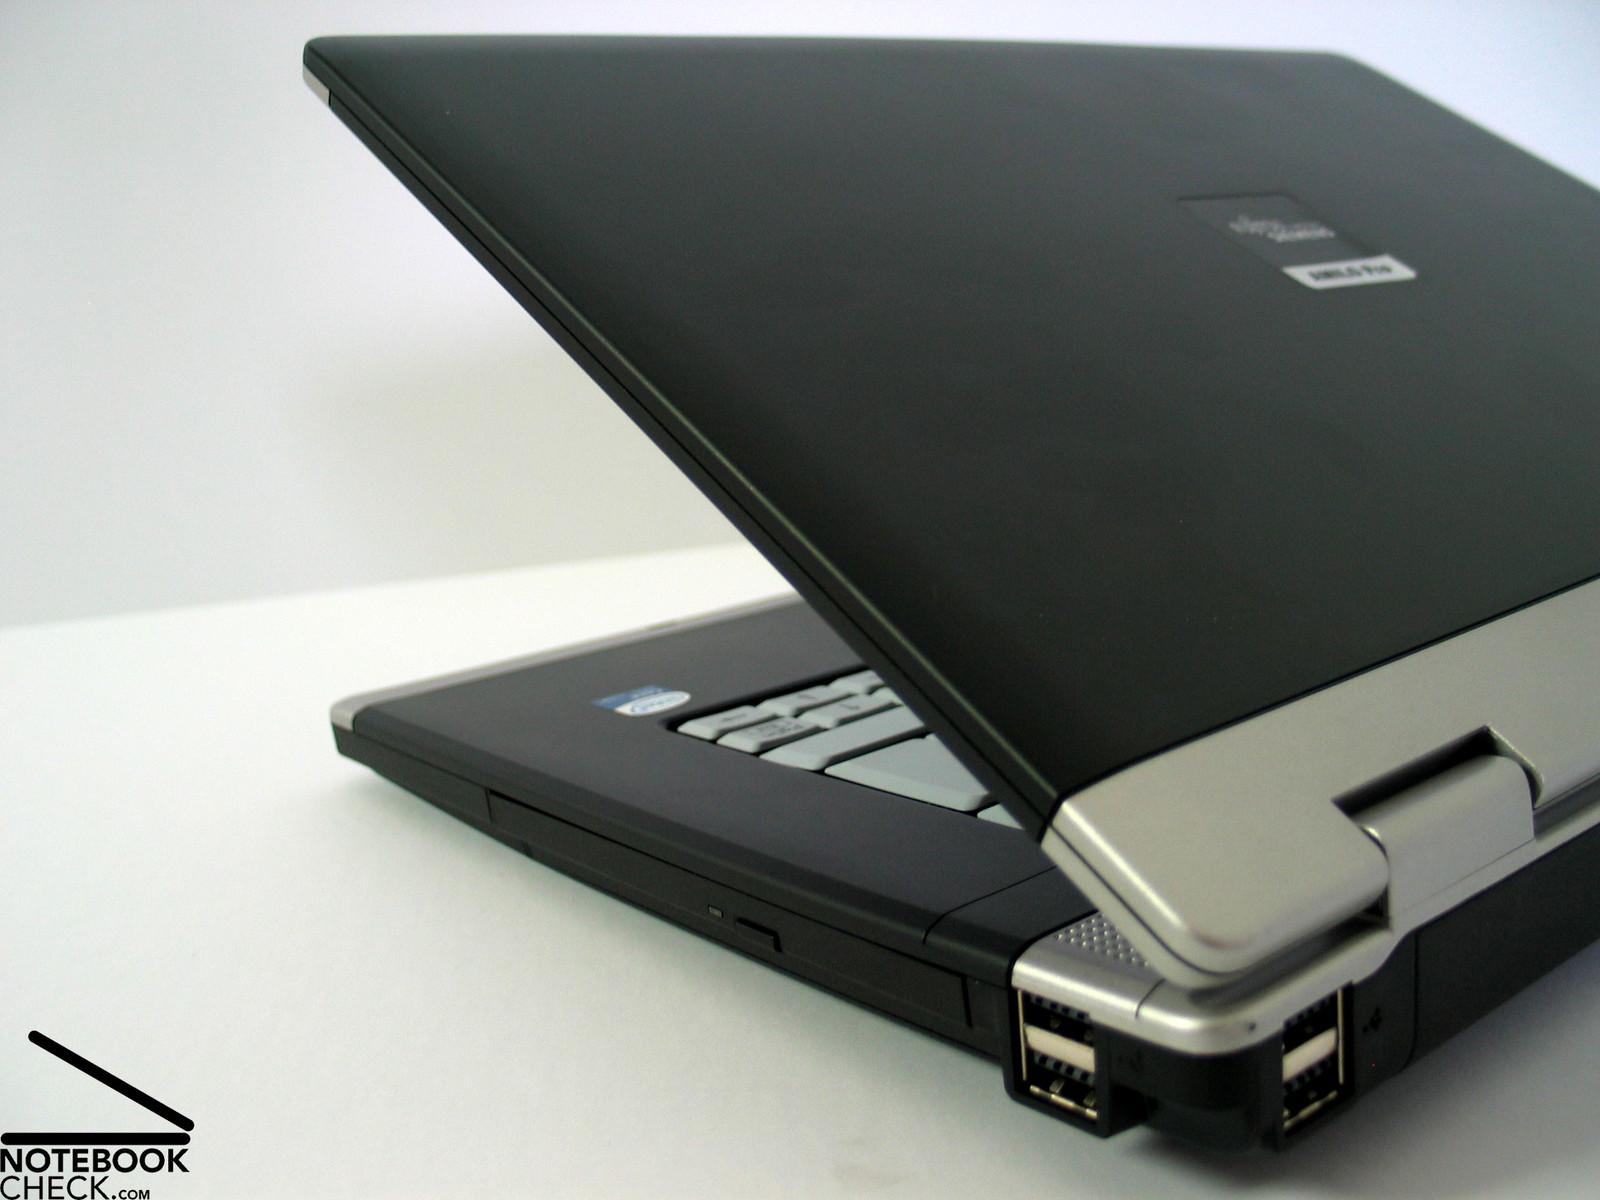 AMILO Pro Edition V3505 Driver - driversupdatecenter.com